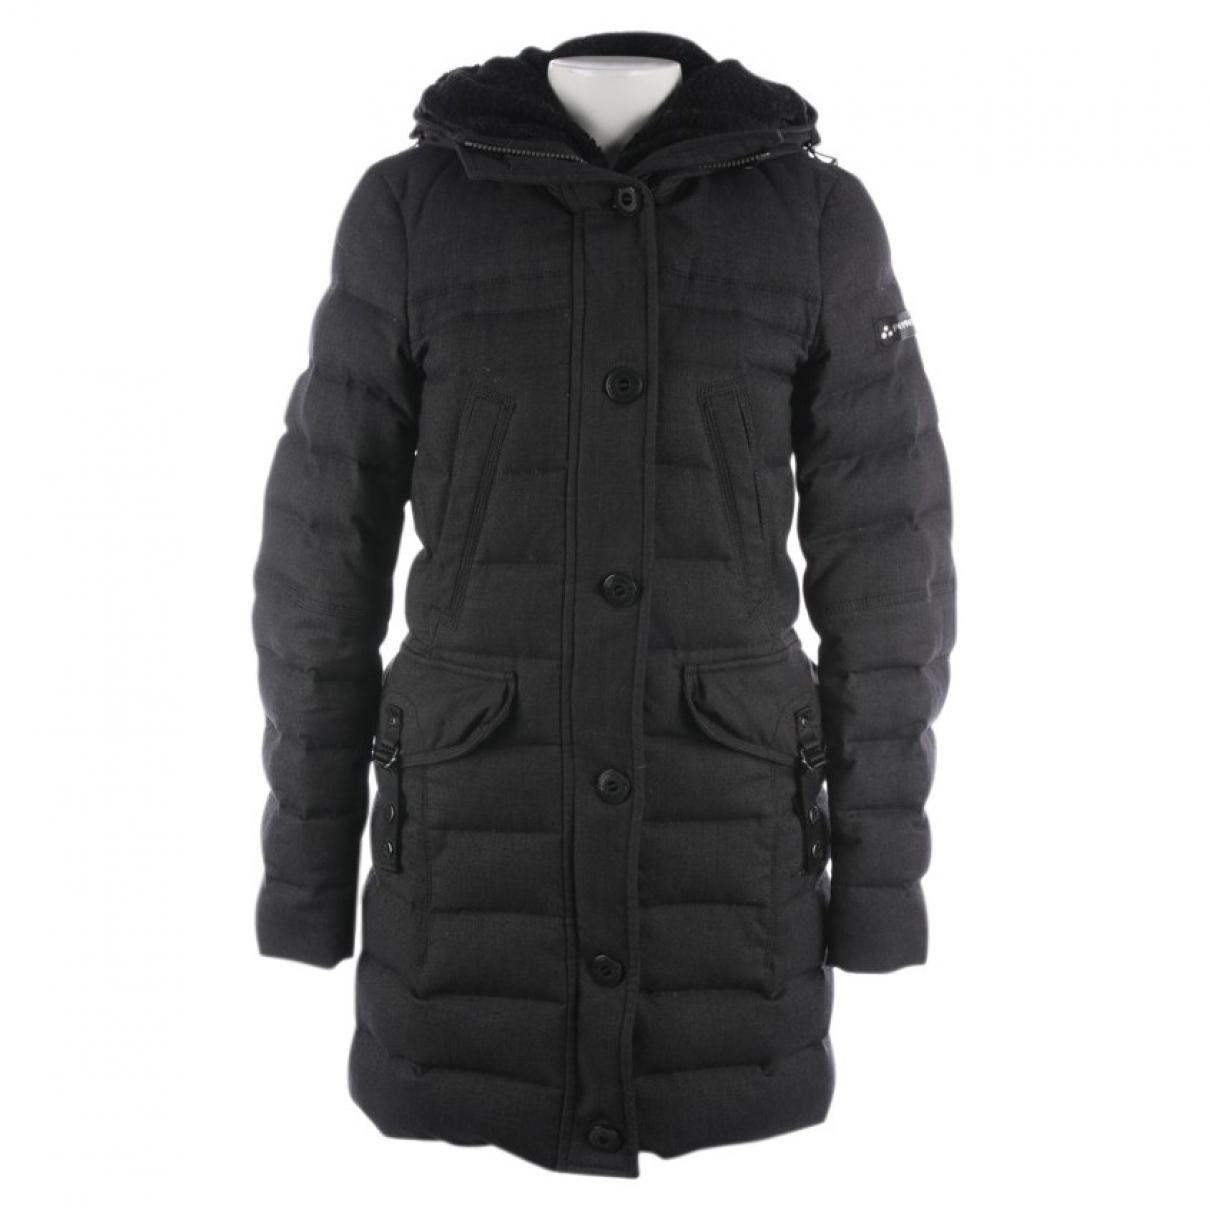 Peuterey \N Black jacket for Women 36 FR